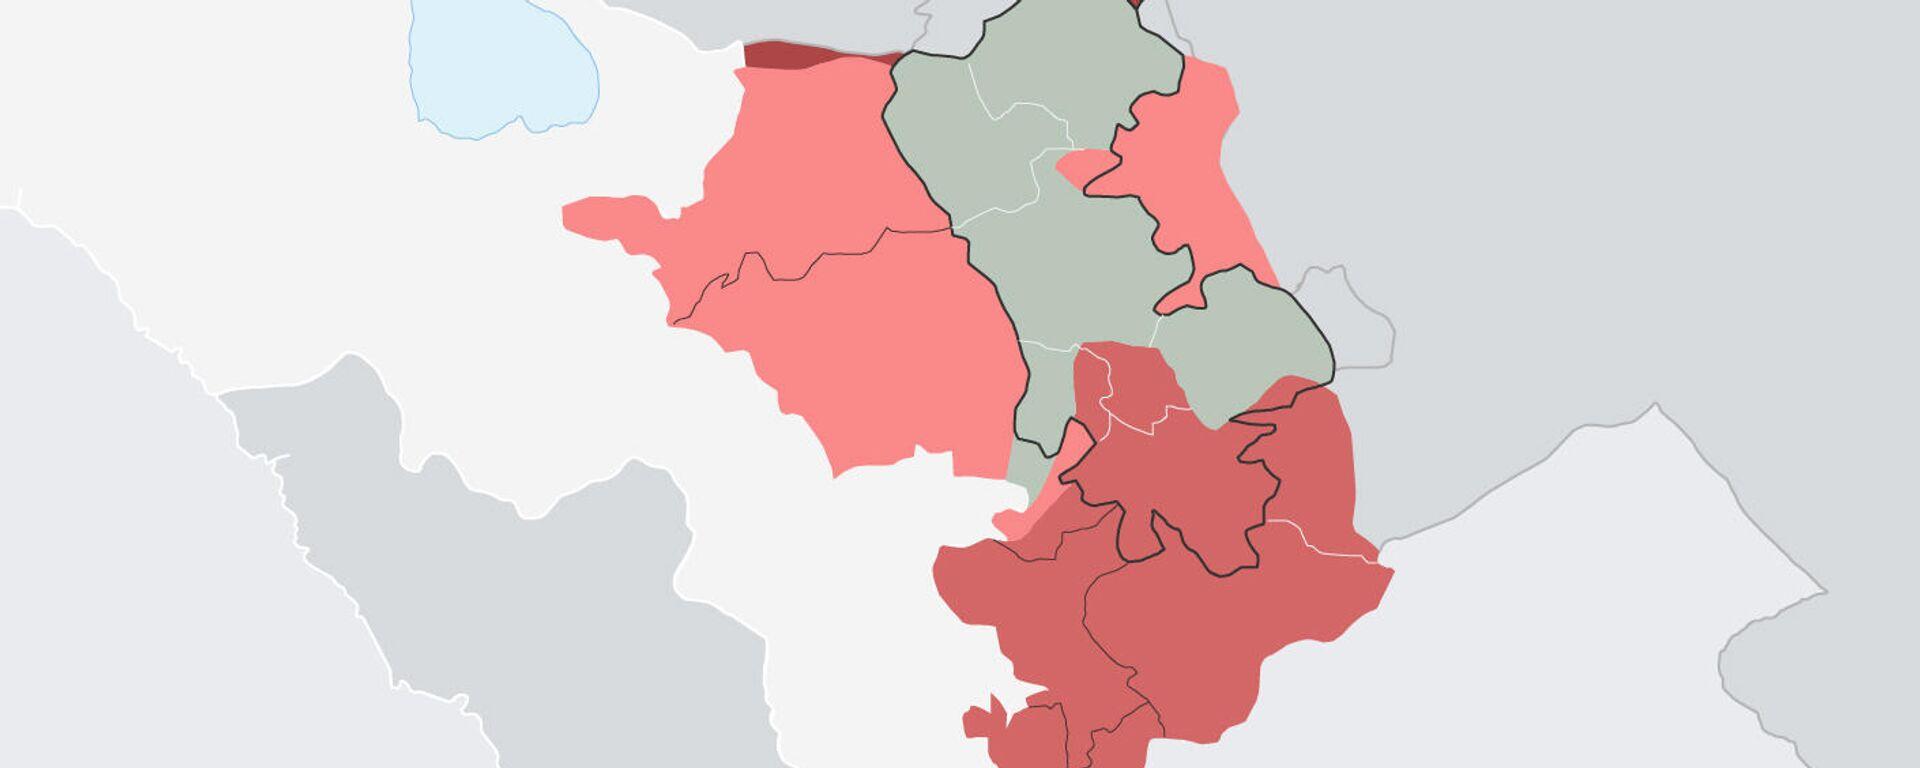 44-дневная война в Нагорном Карабахе в цифрах - Sputnik Армения, 1920, 27.09.2021